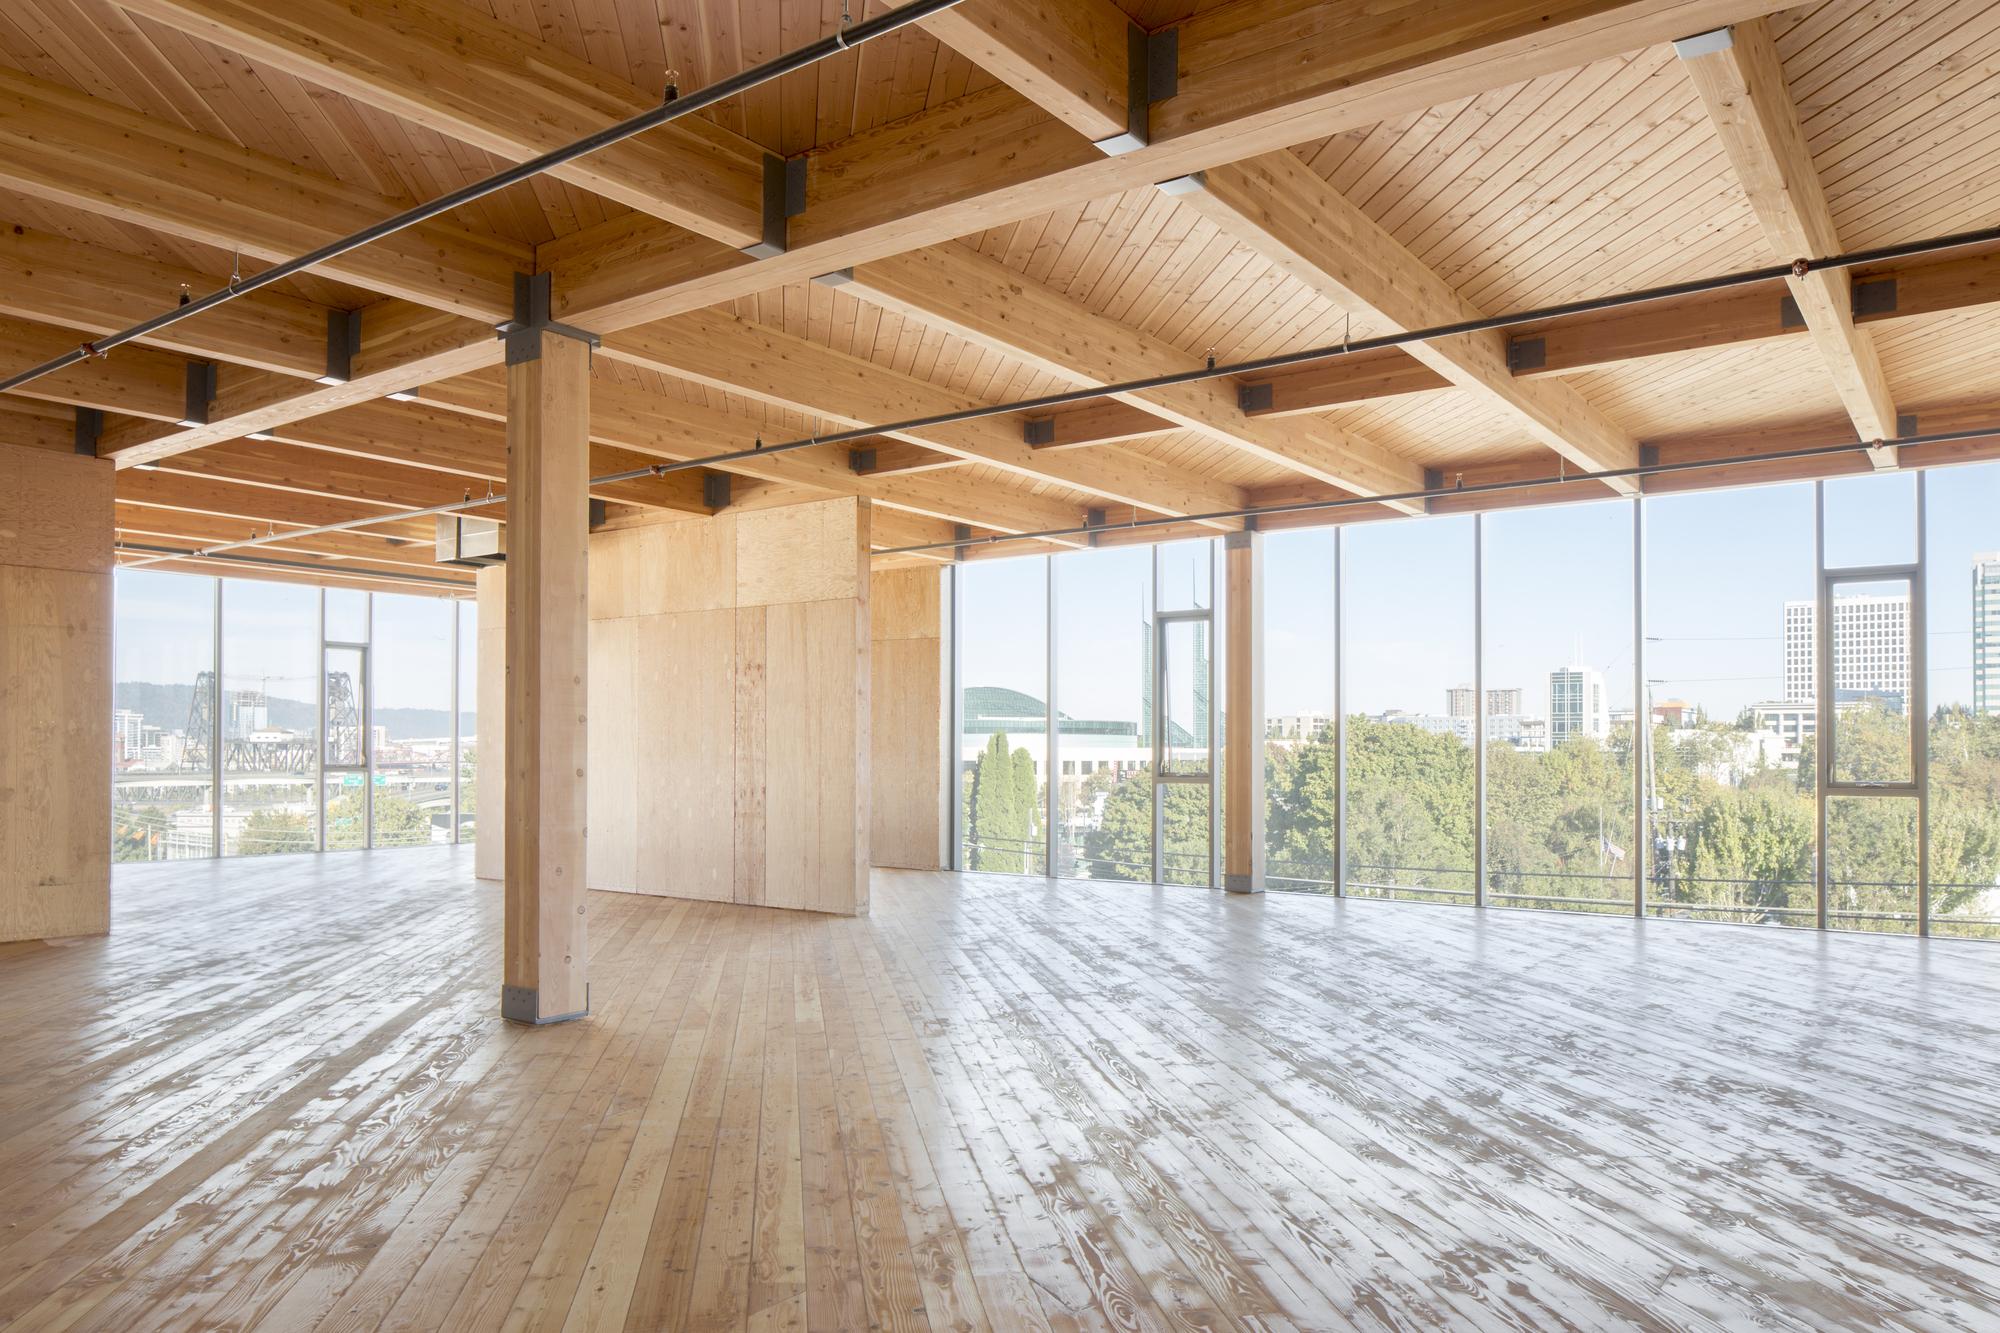 2016 Wood Design Award Winners Announced | ArchDaily